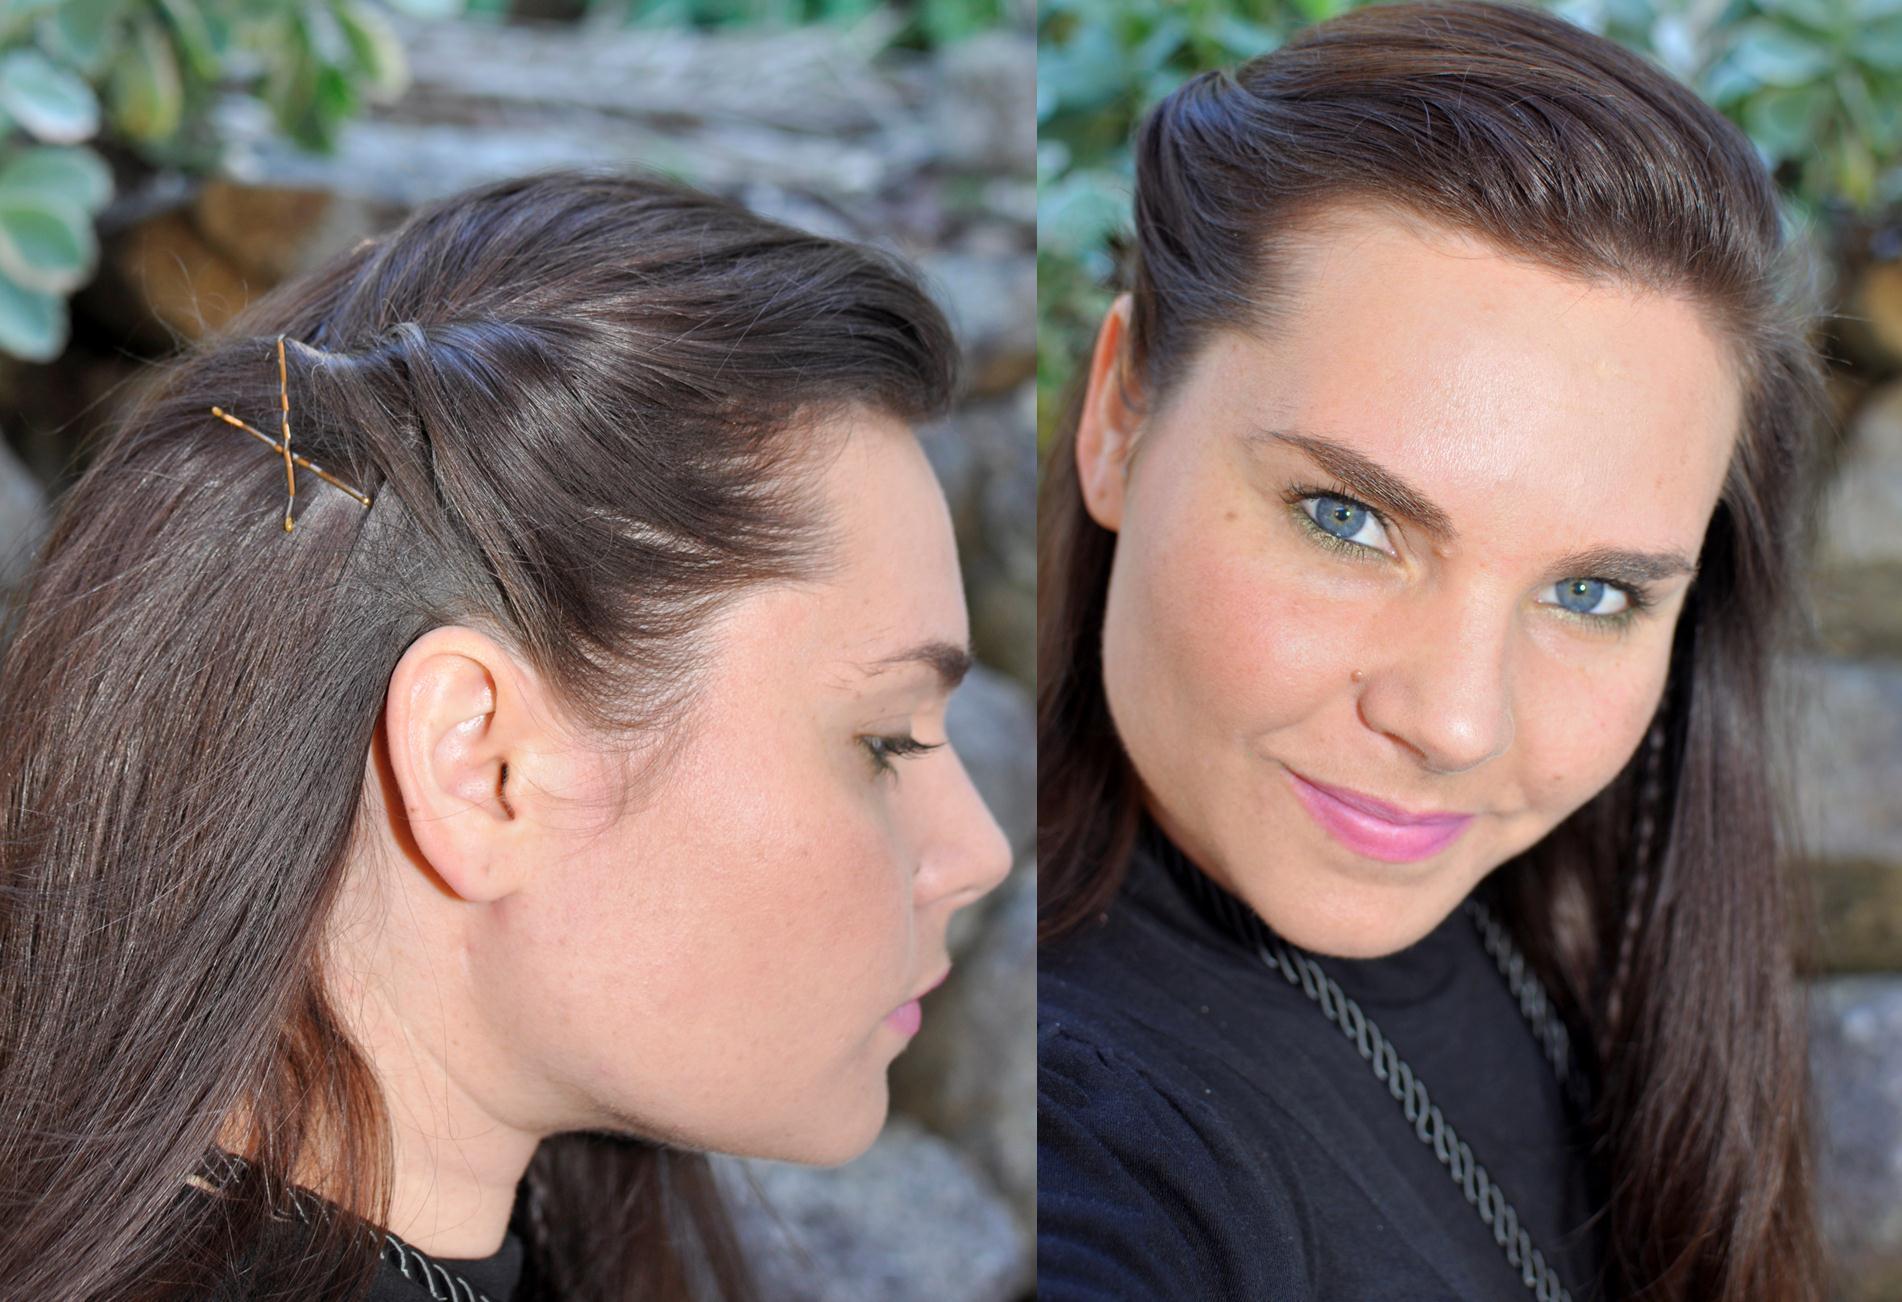 Groovy Bobby Pin Hair Styles For Short Hair Hairstyles For Men Maxibearus